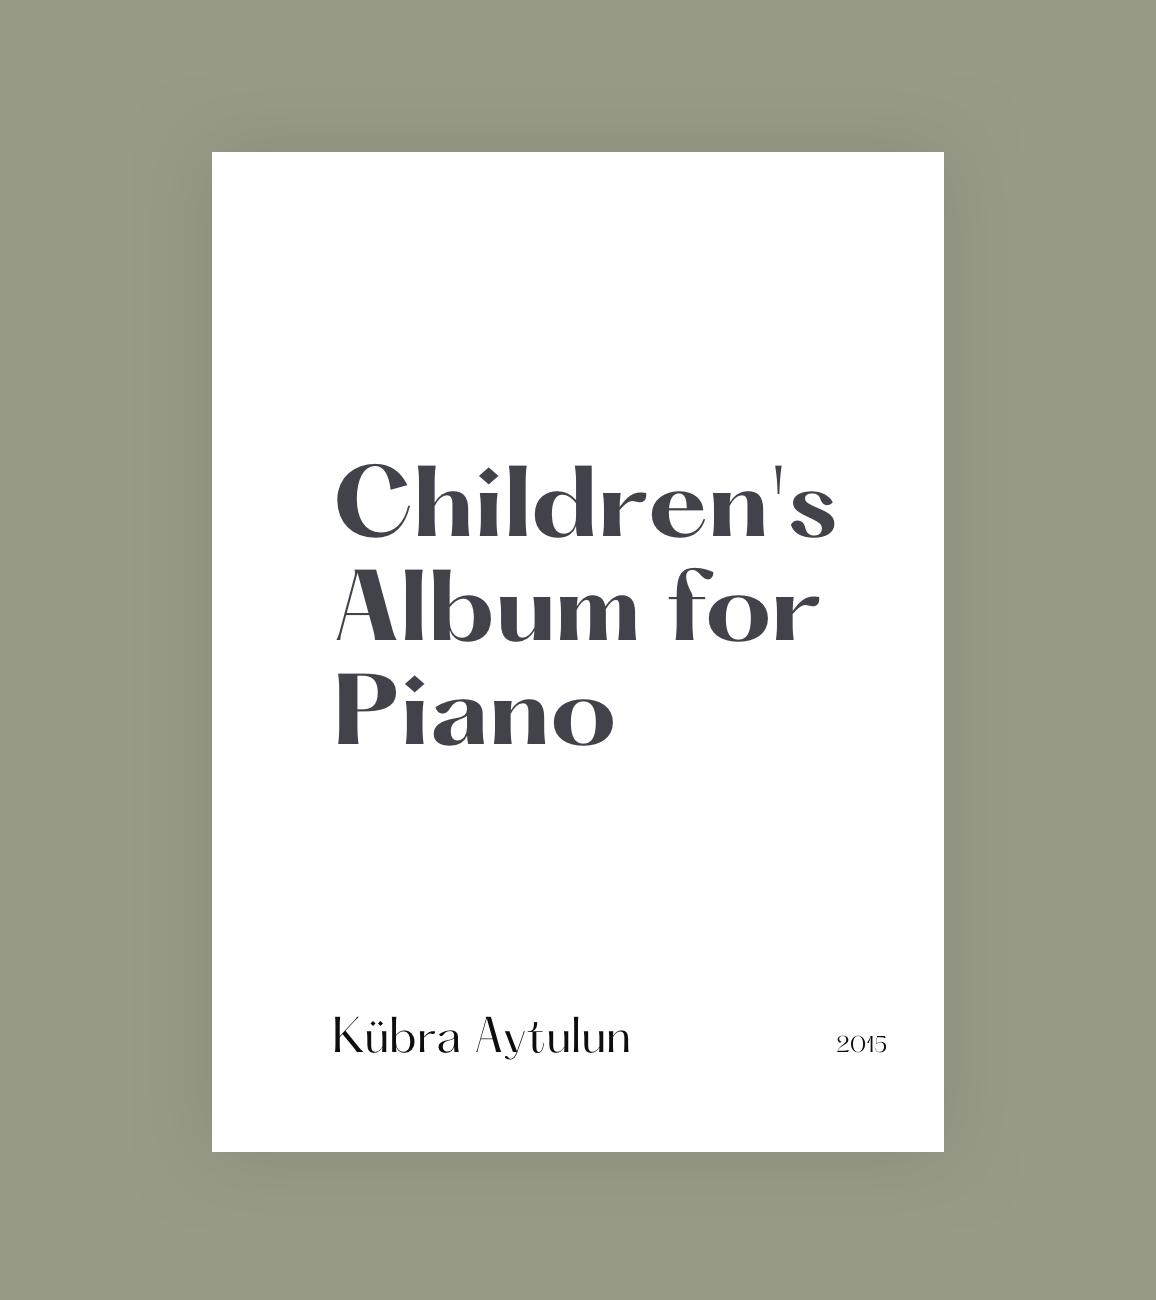 Children's Album for Piano